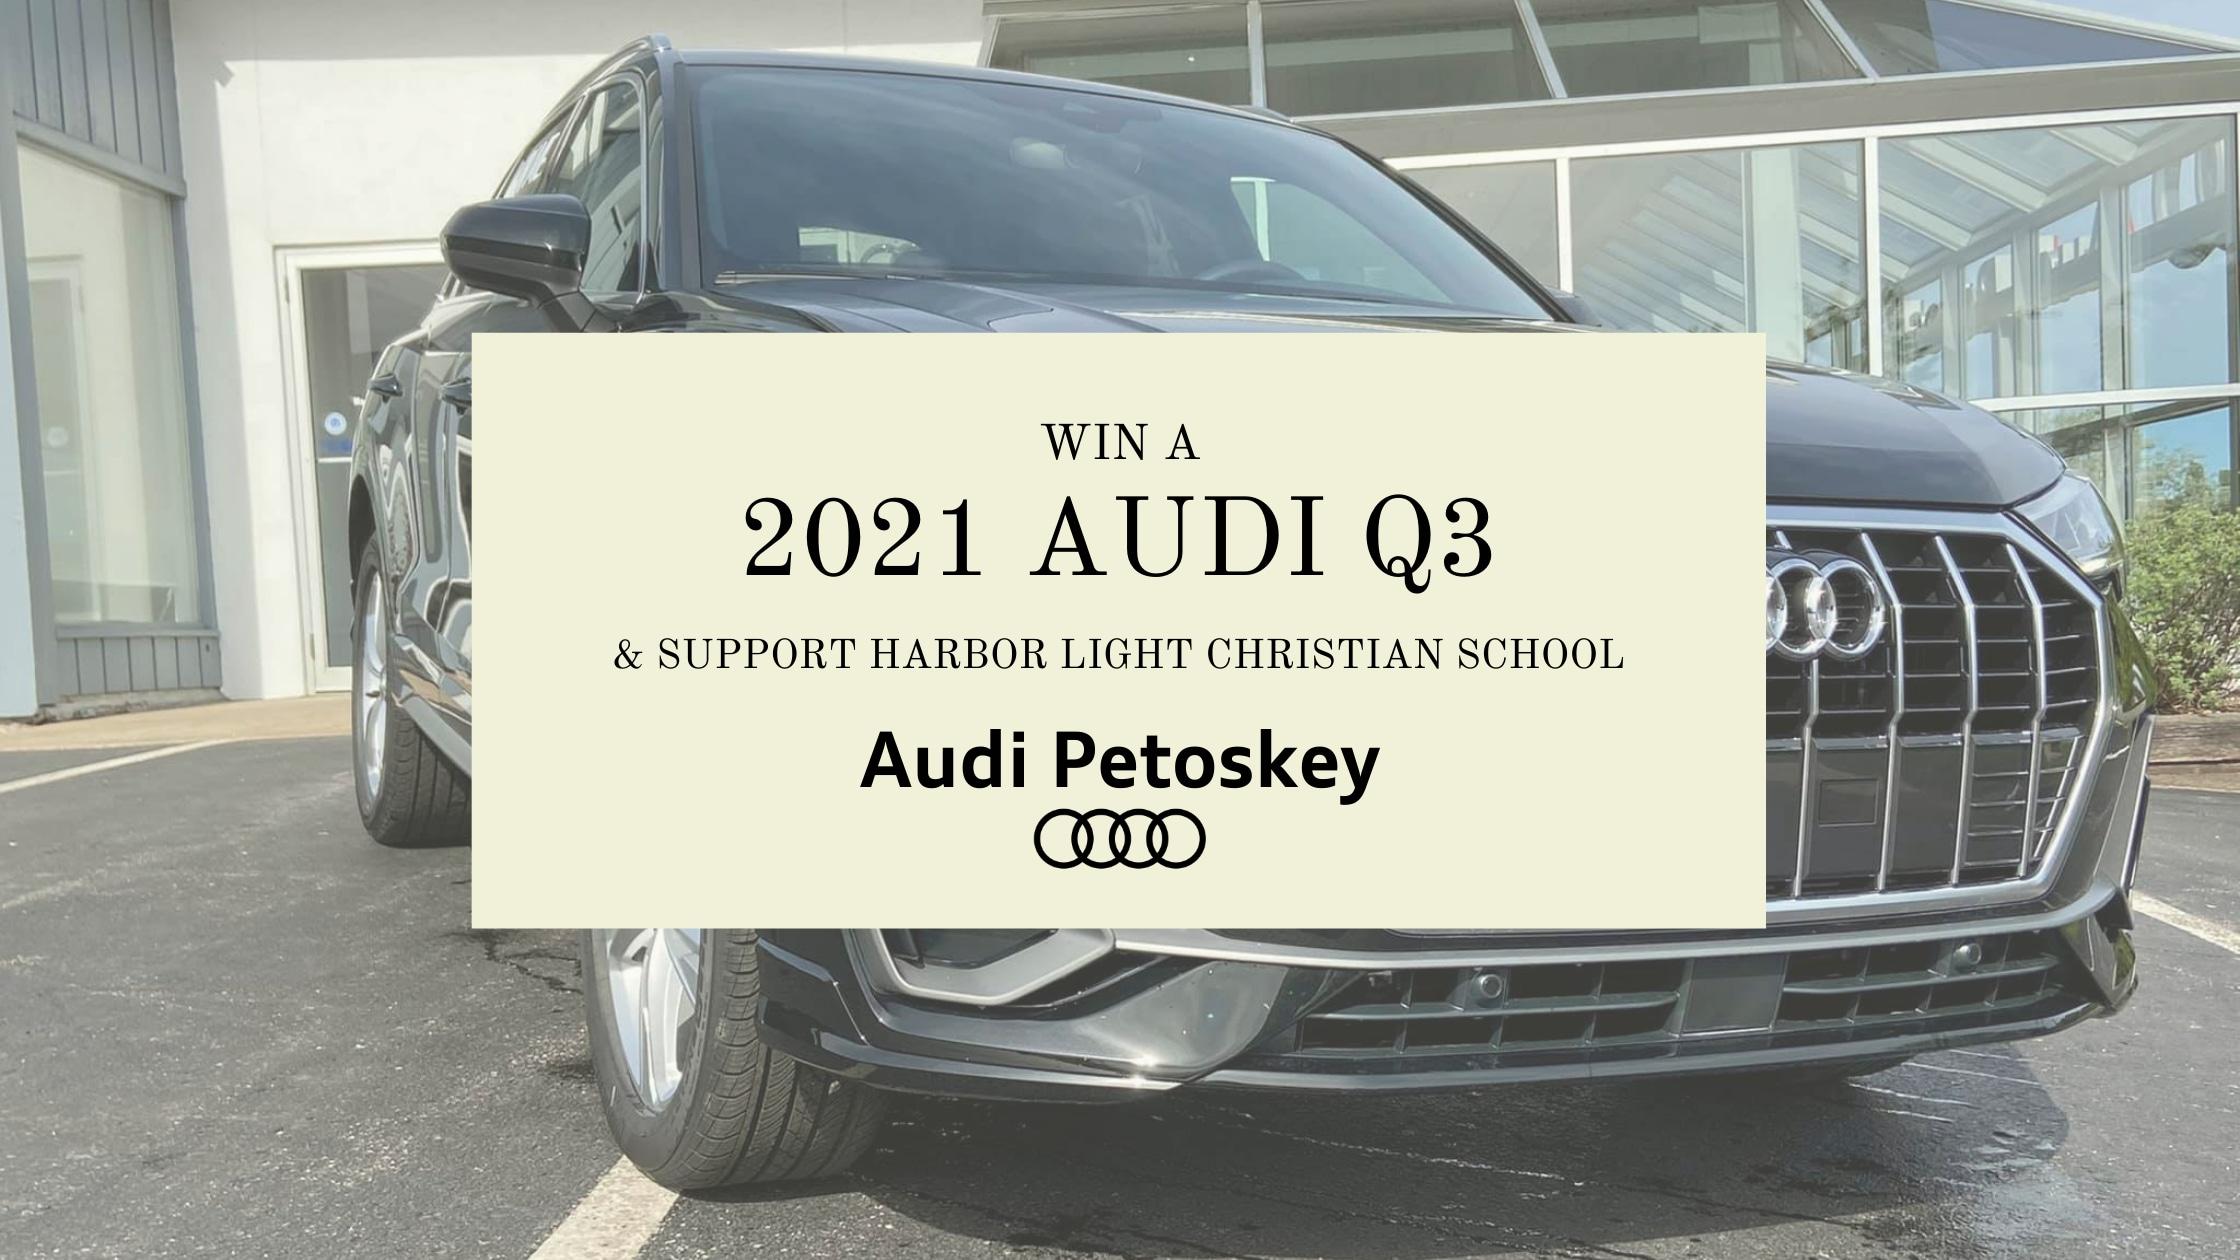 2240 × 1260